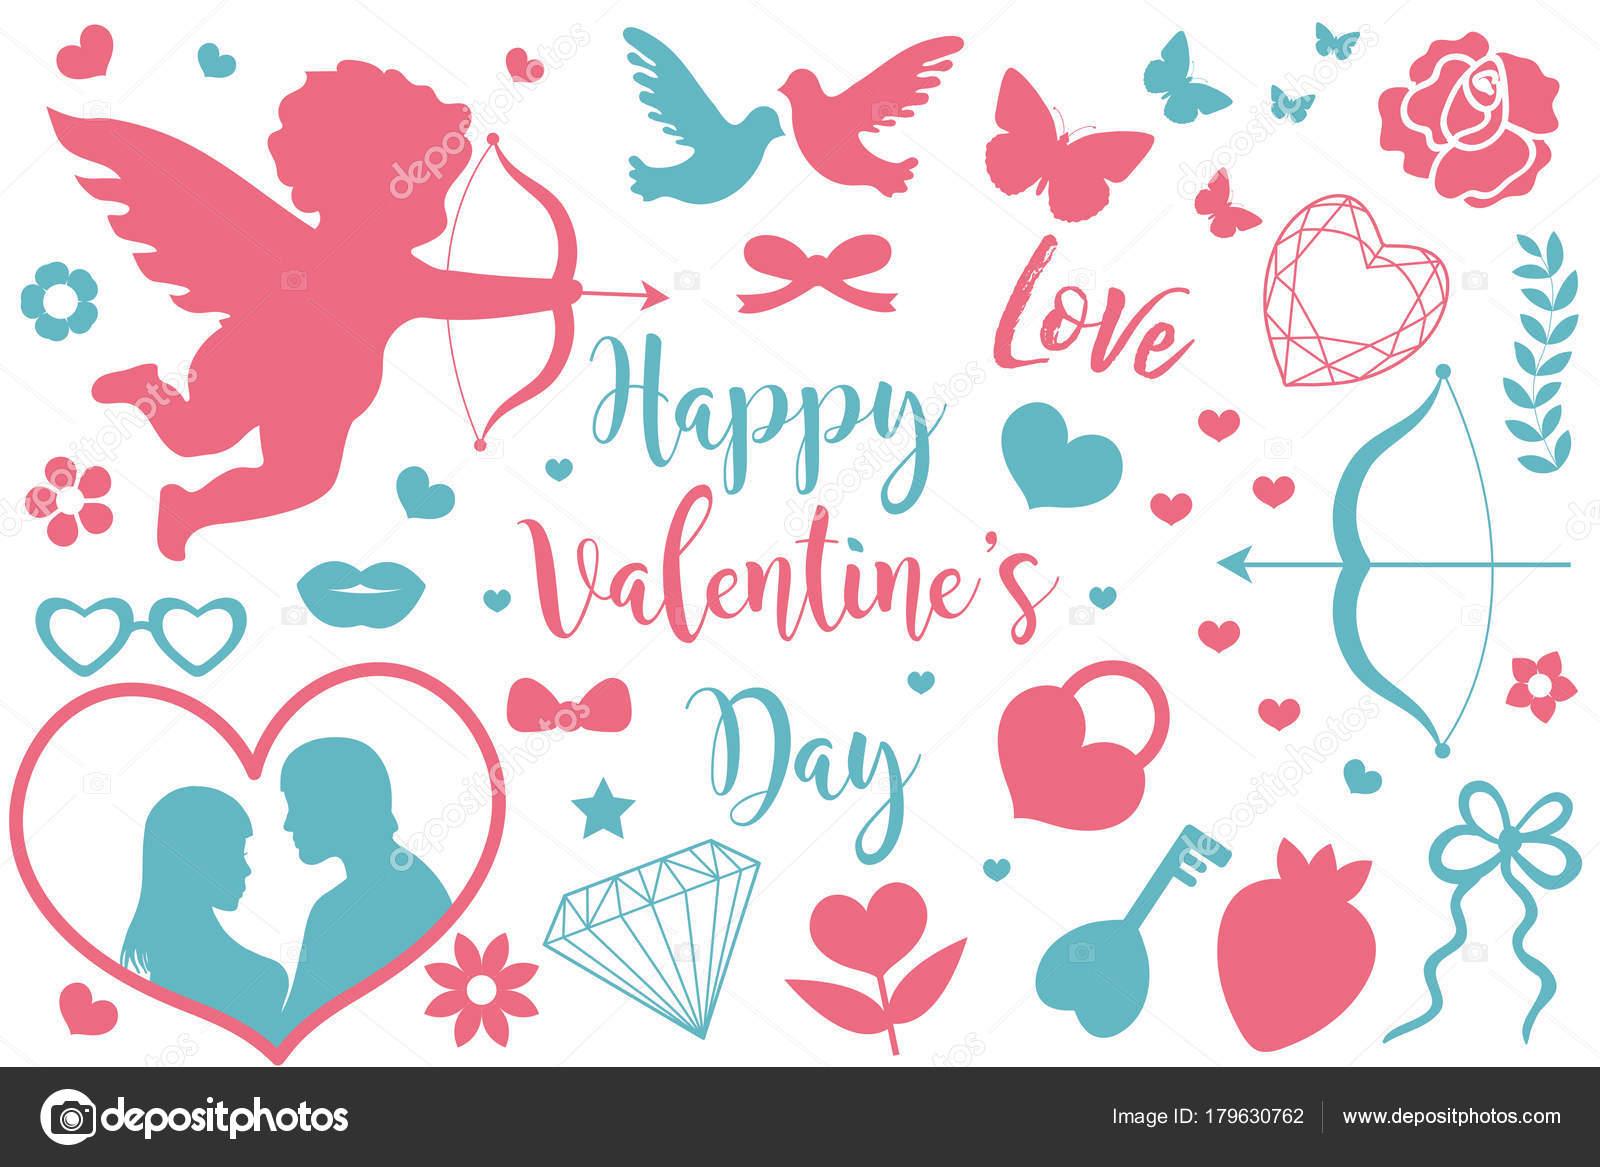 Happy Valentines Day Icon Set Of Stencil Silhouettes Cute Romance